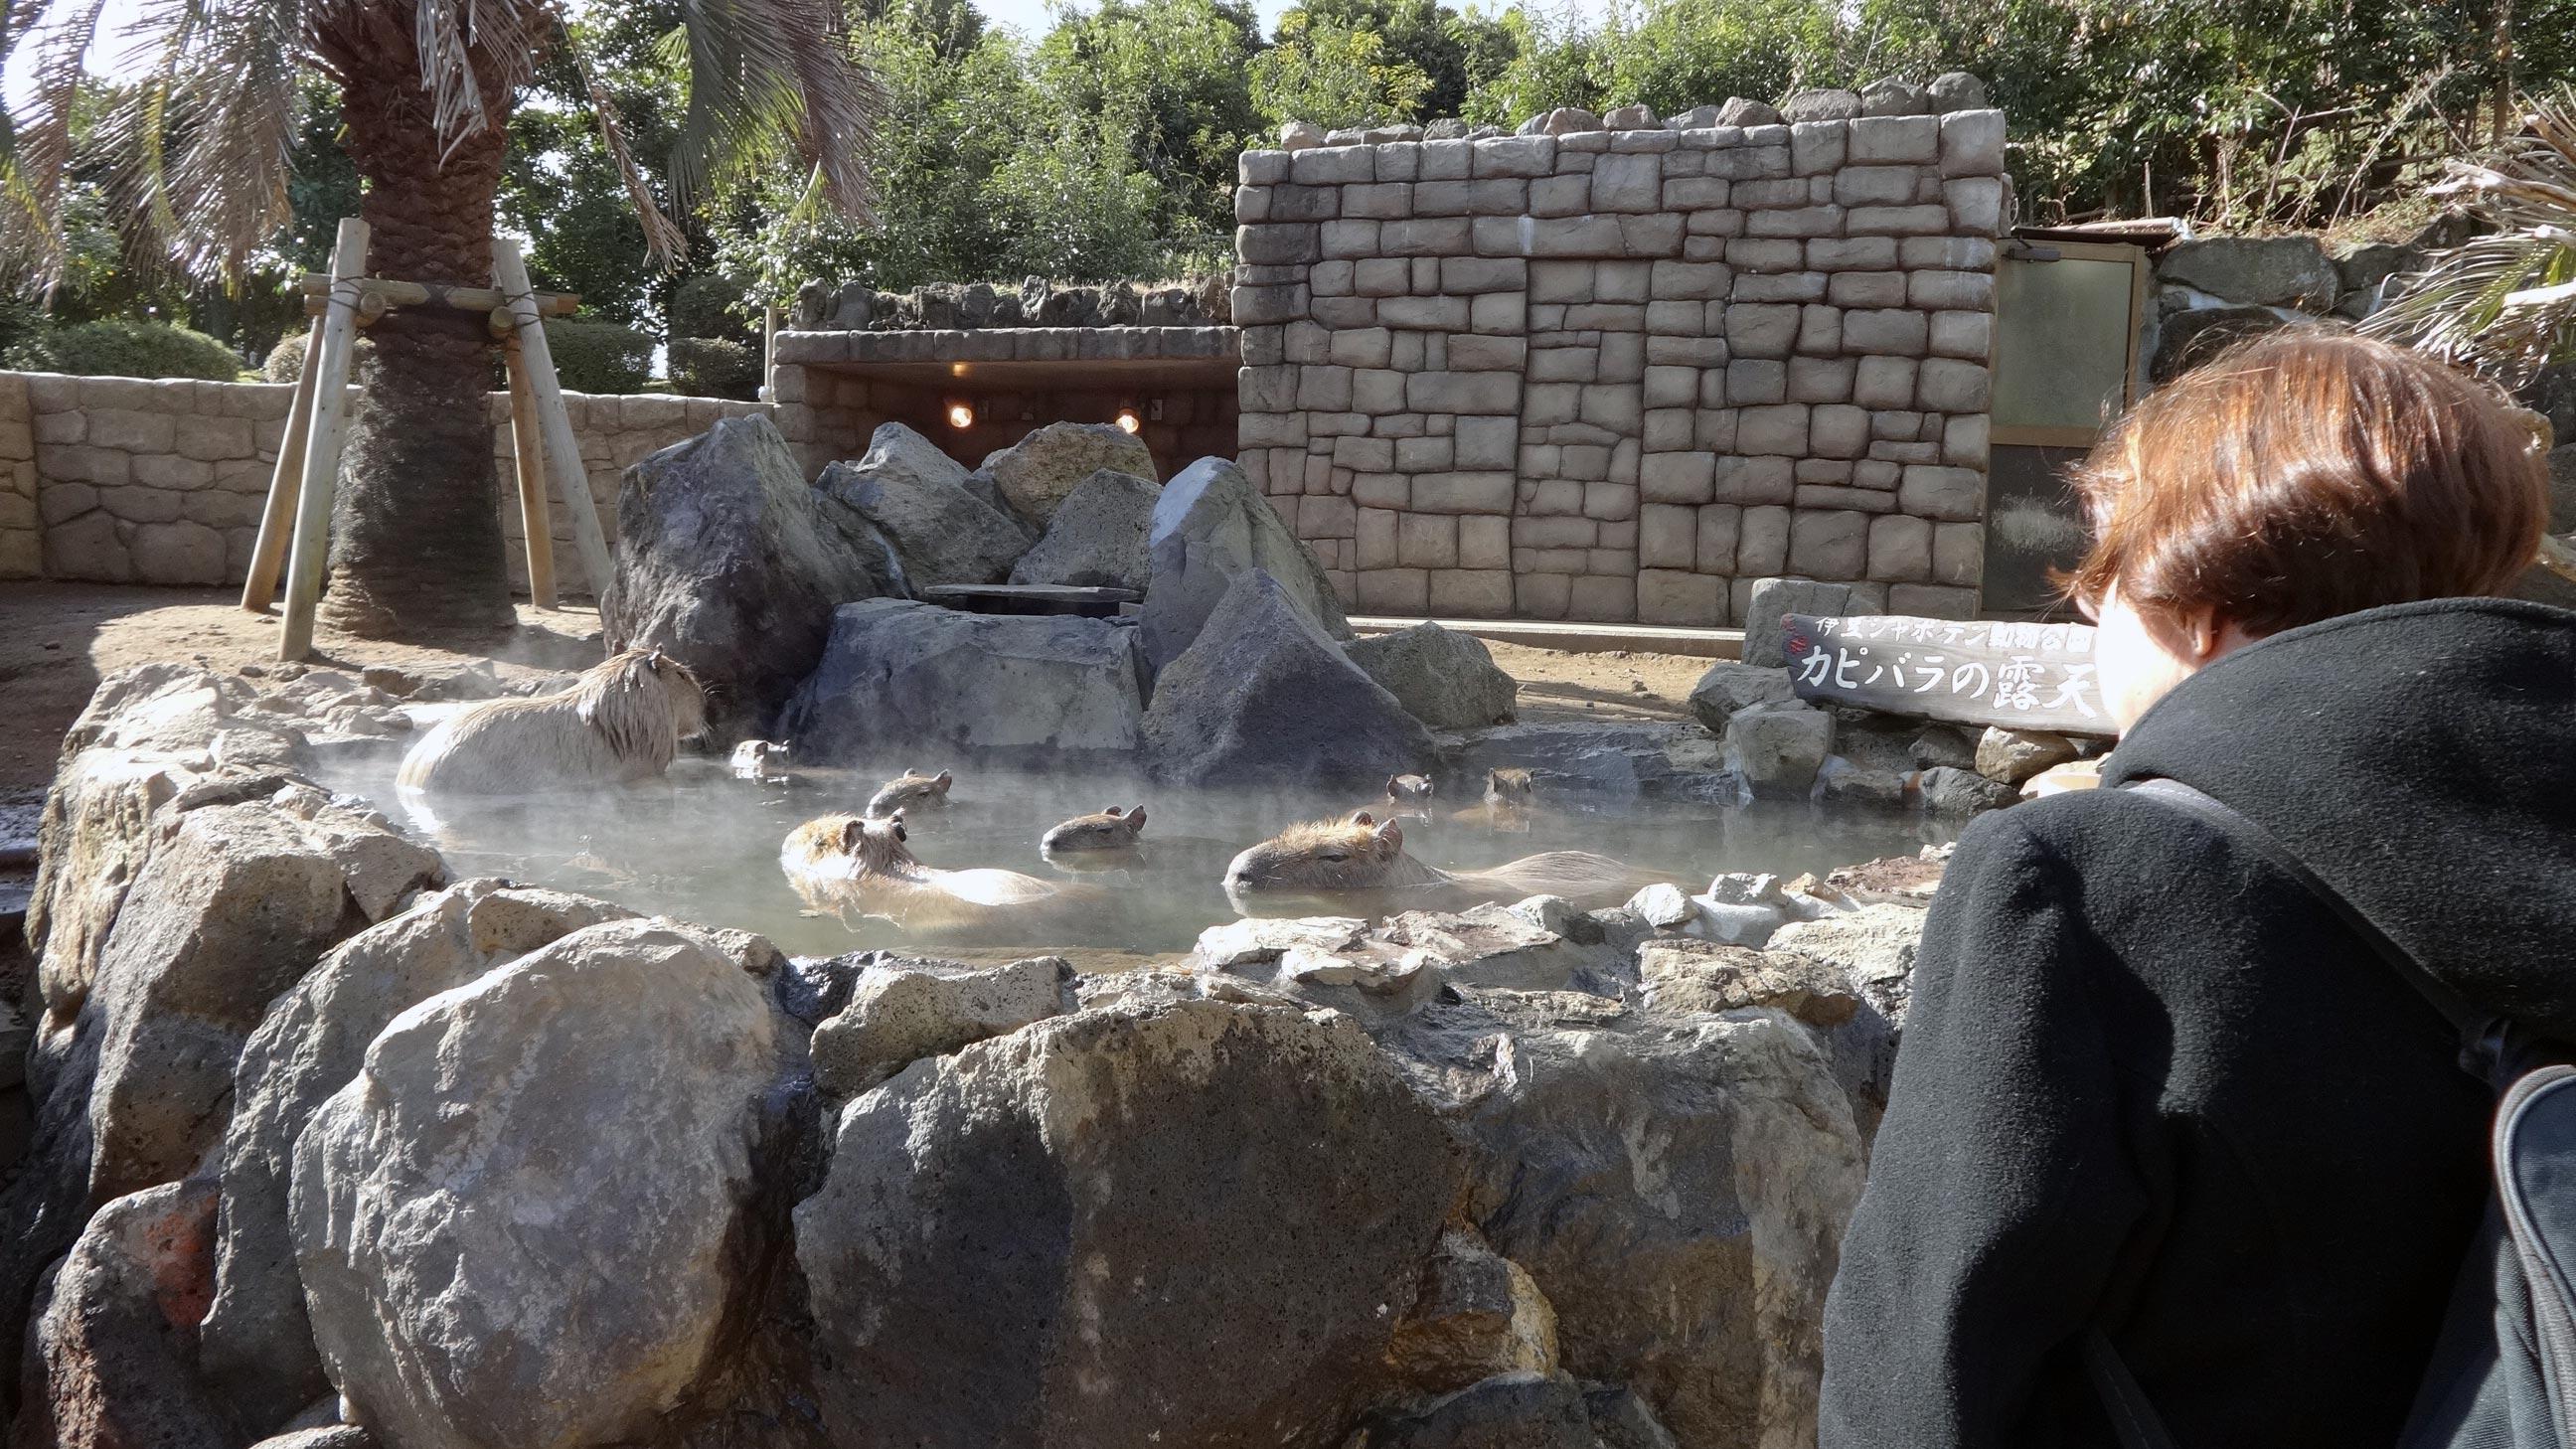 izu shaboten zoo hot springs filled with capybara